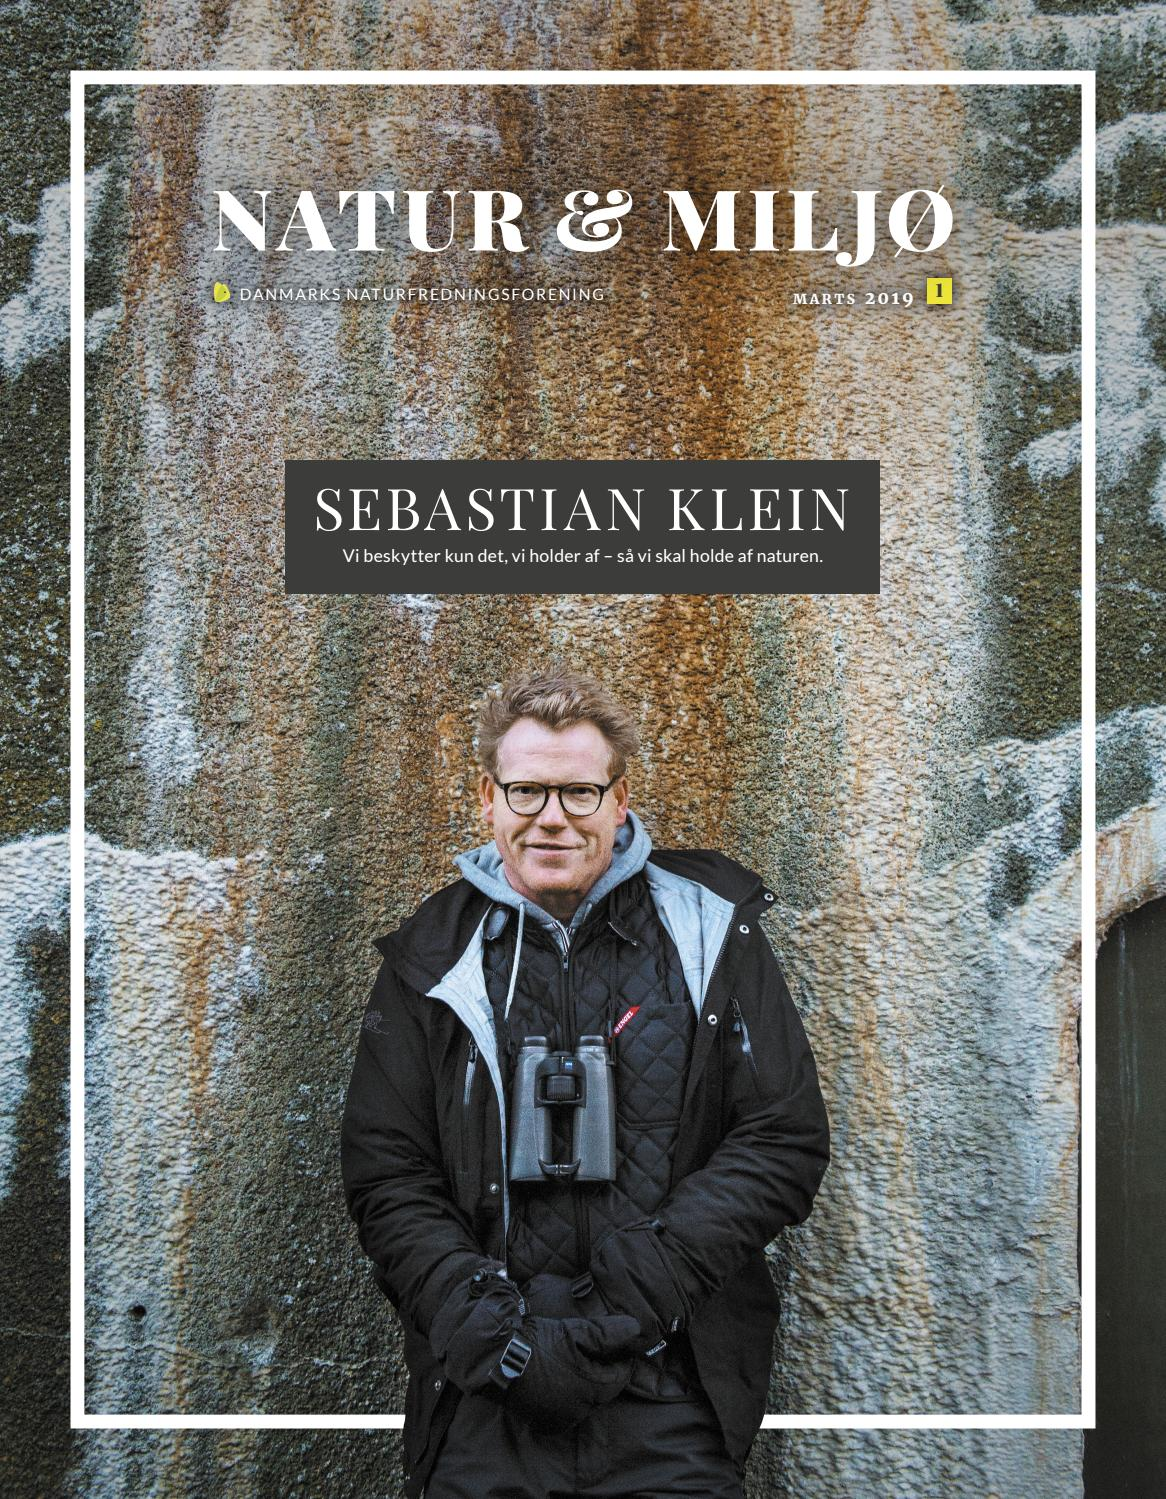 4ccf08f8a Natur & Miljø marts 2019 by Danmarks Naturfredningsforening - issuu